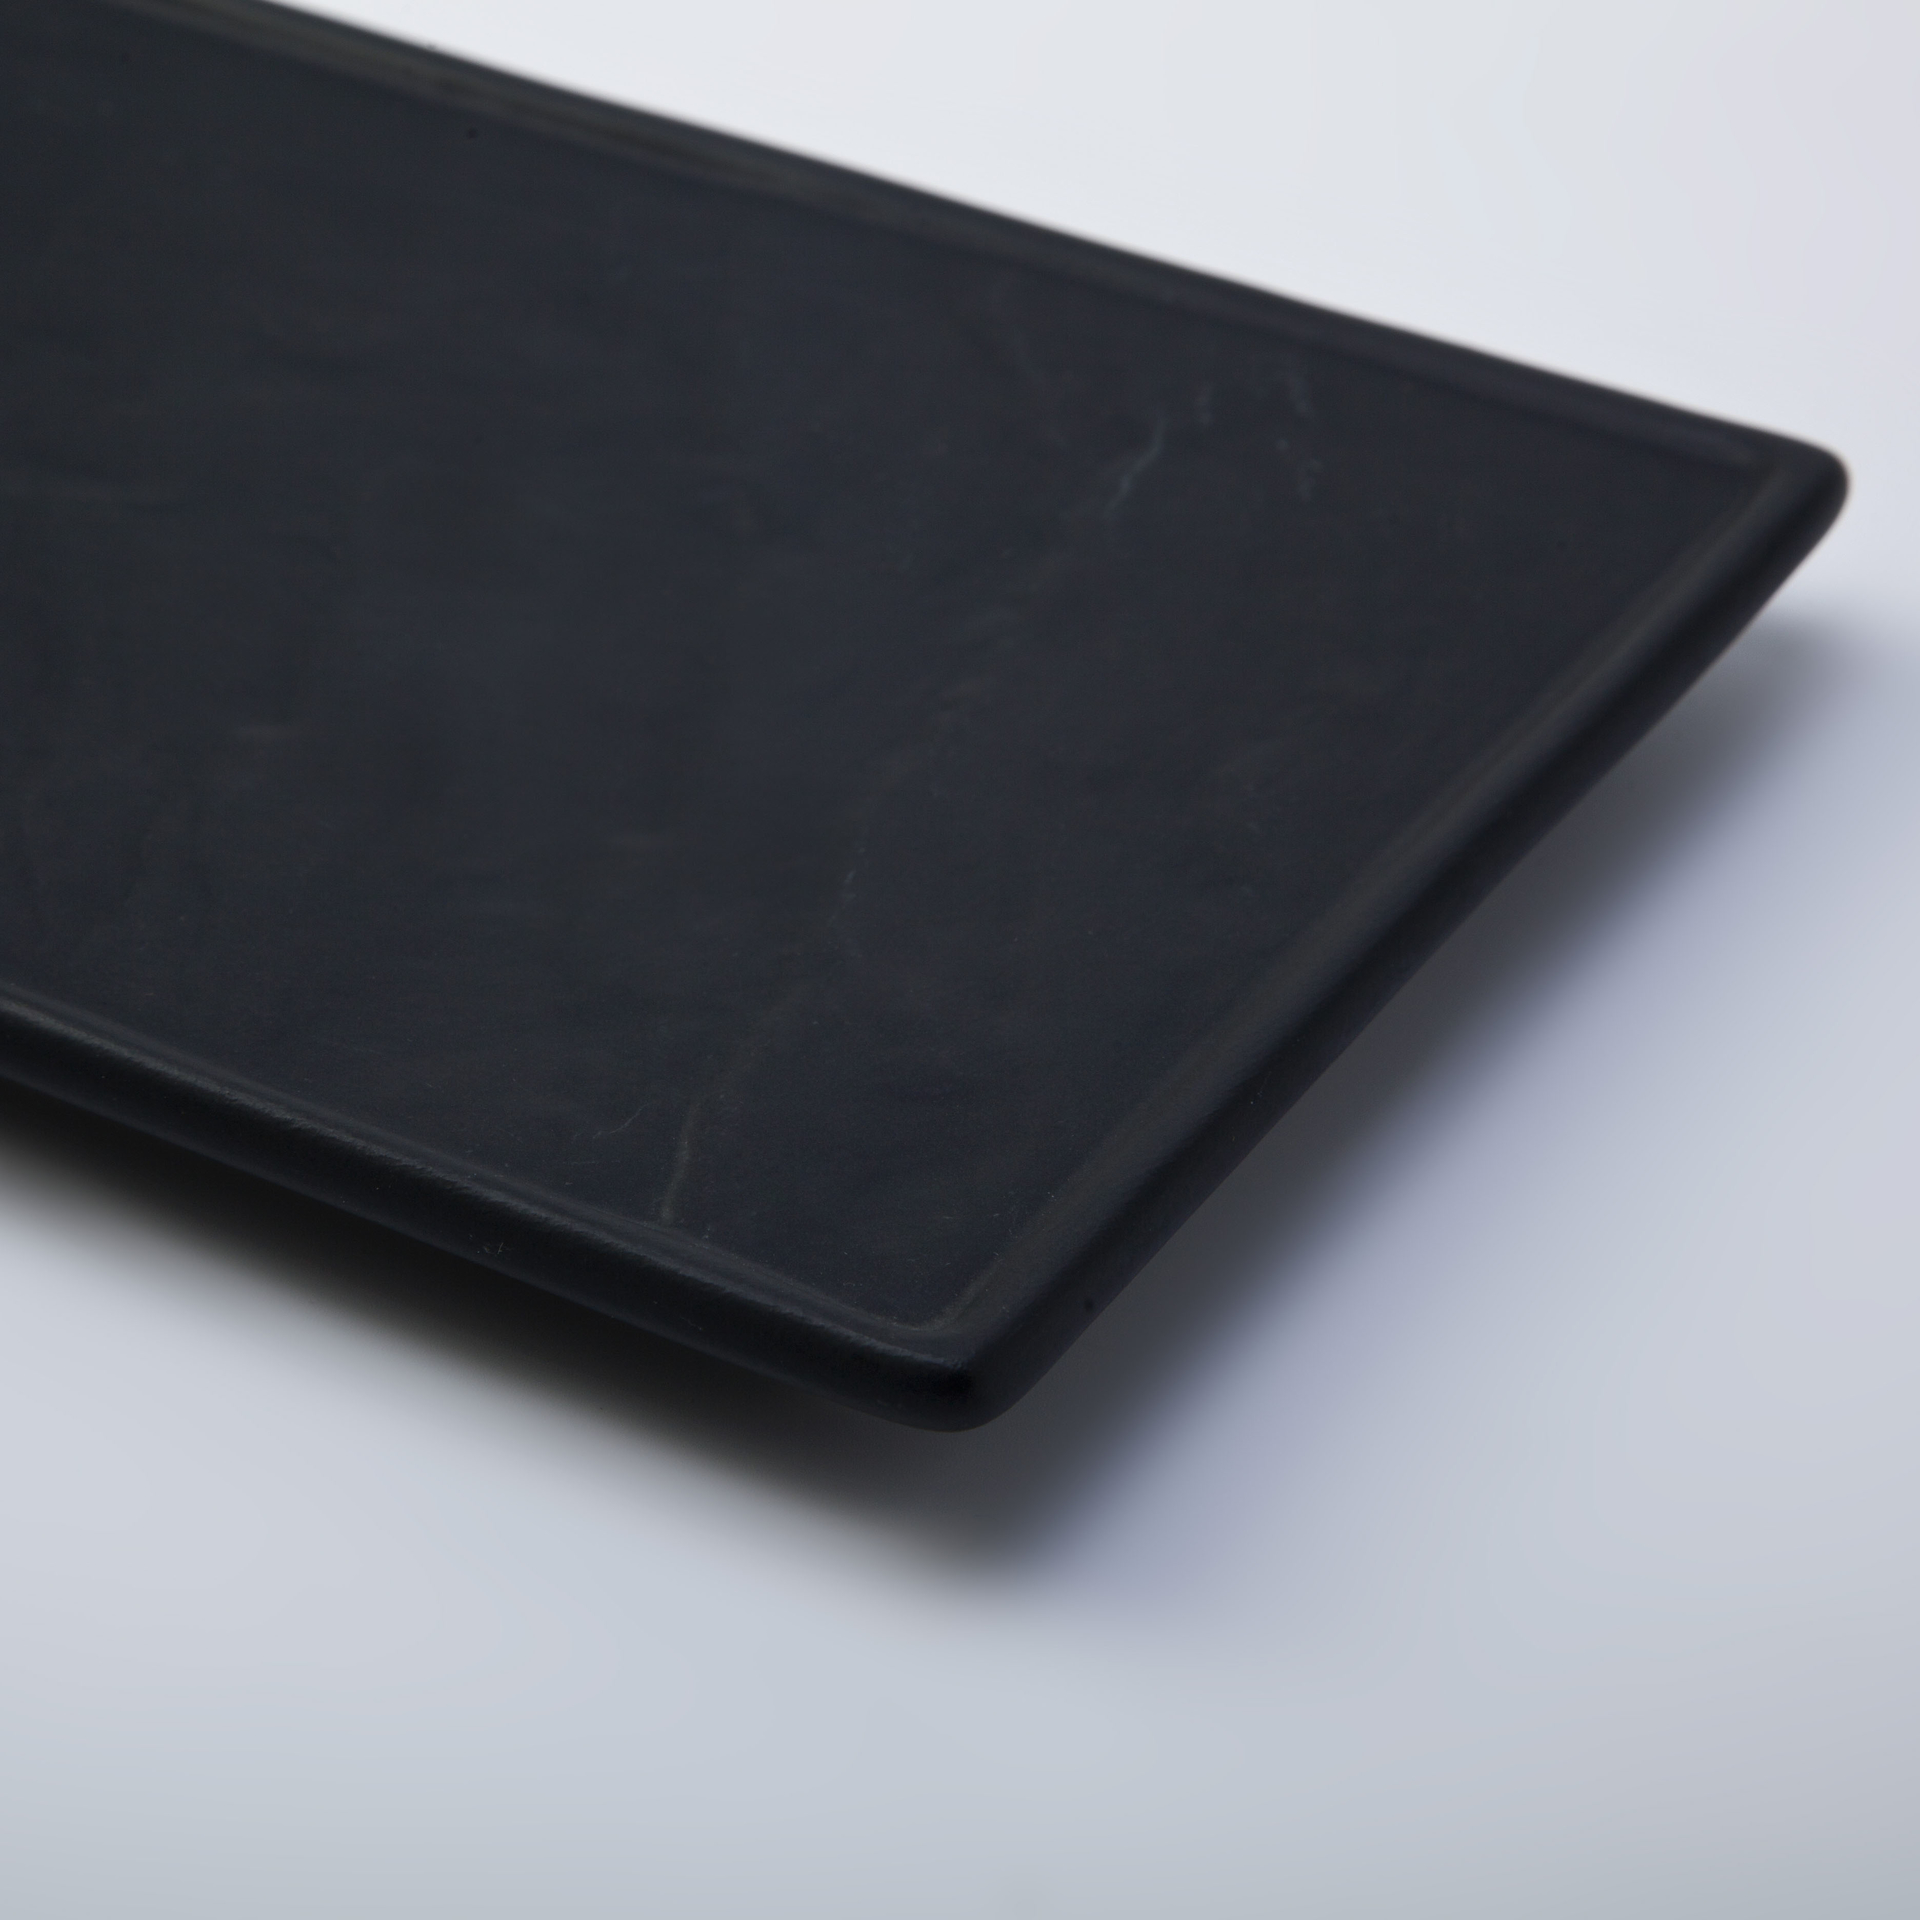 Sushi Restaurant Plato Rectangular, Australian Japanese Dinnerware Sets Black, Hotel Sushi SetRectangle Ceramic Plate